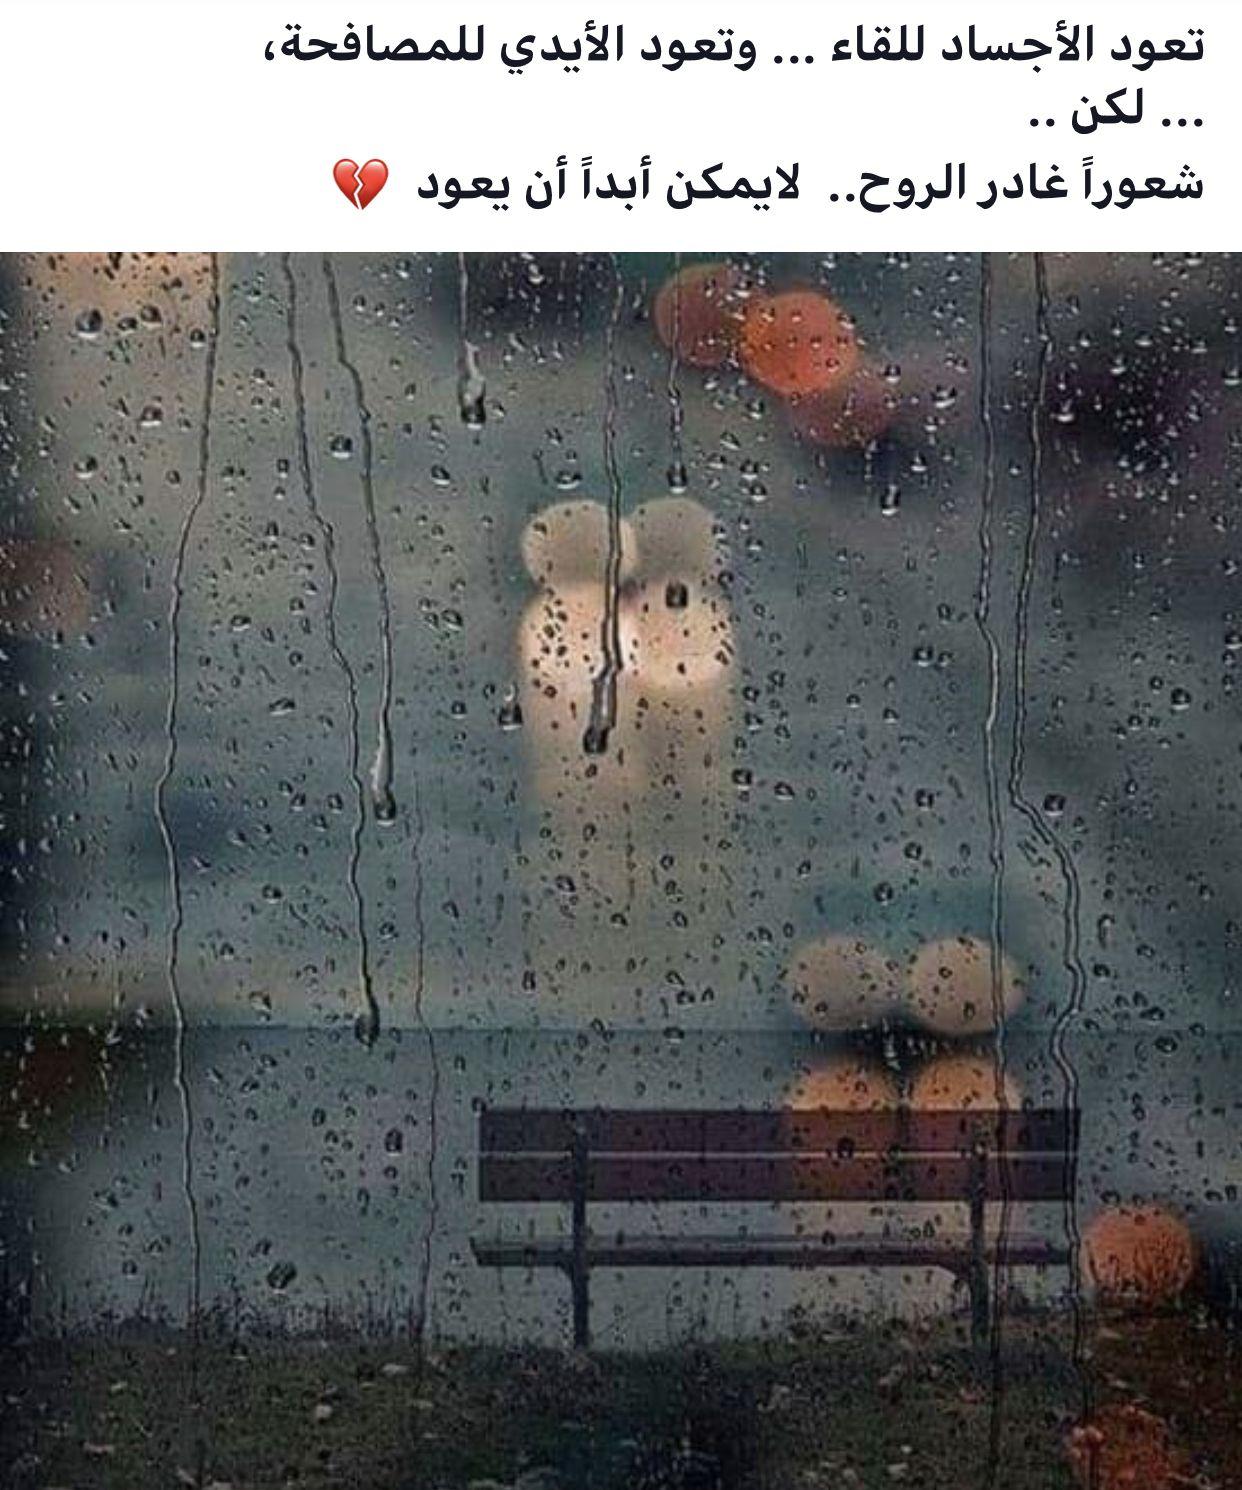 Pin By عطر الياسمين On ك م Someday Instagram Posts Instagram